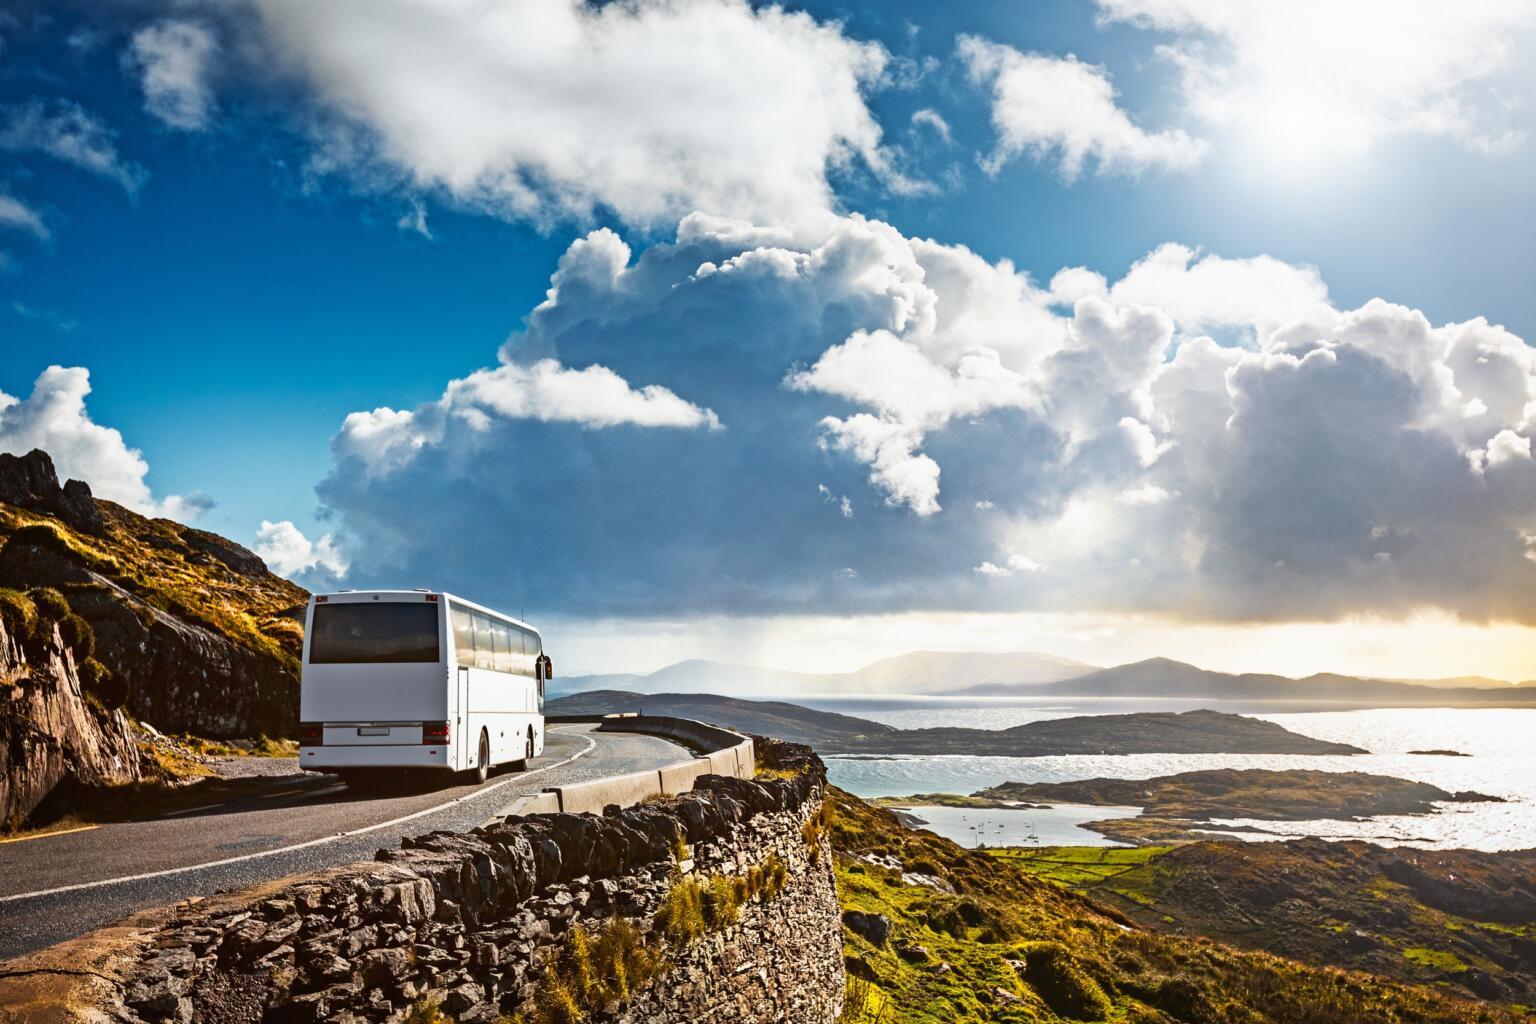 how to get around Ireland cheap